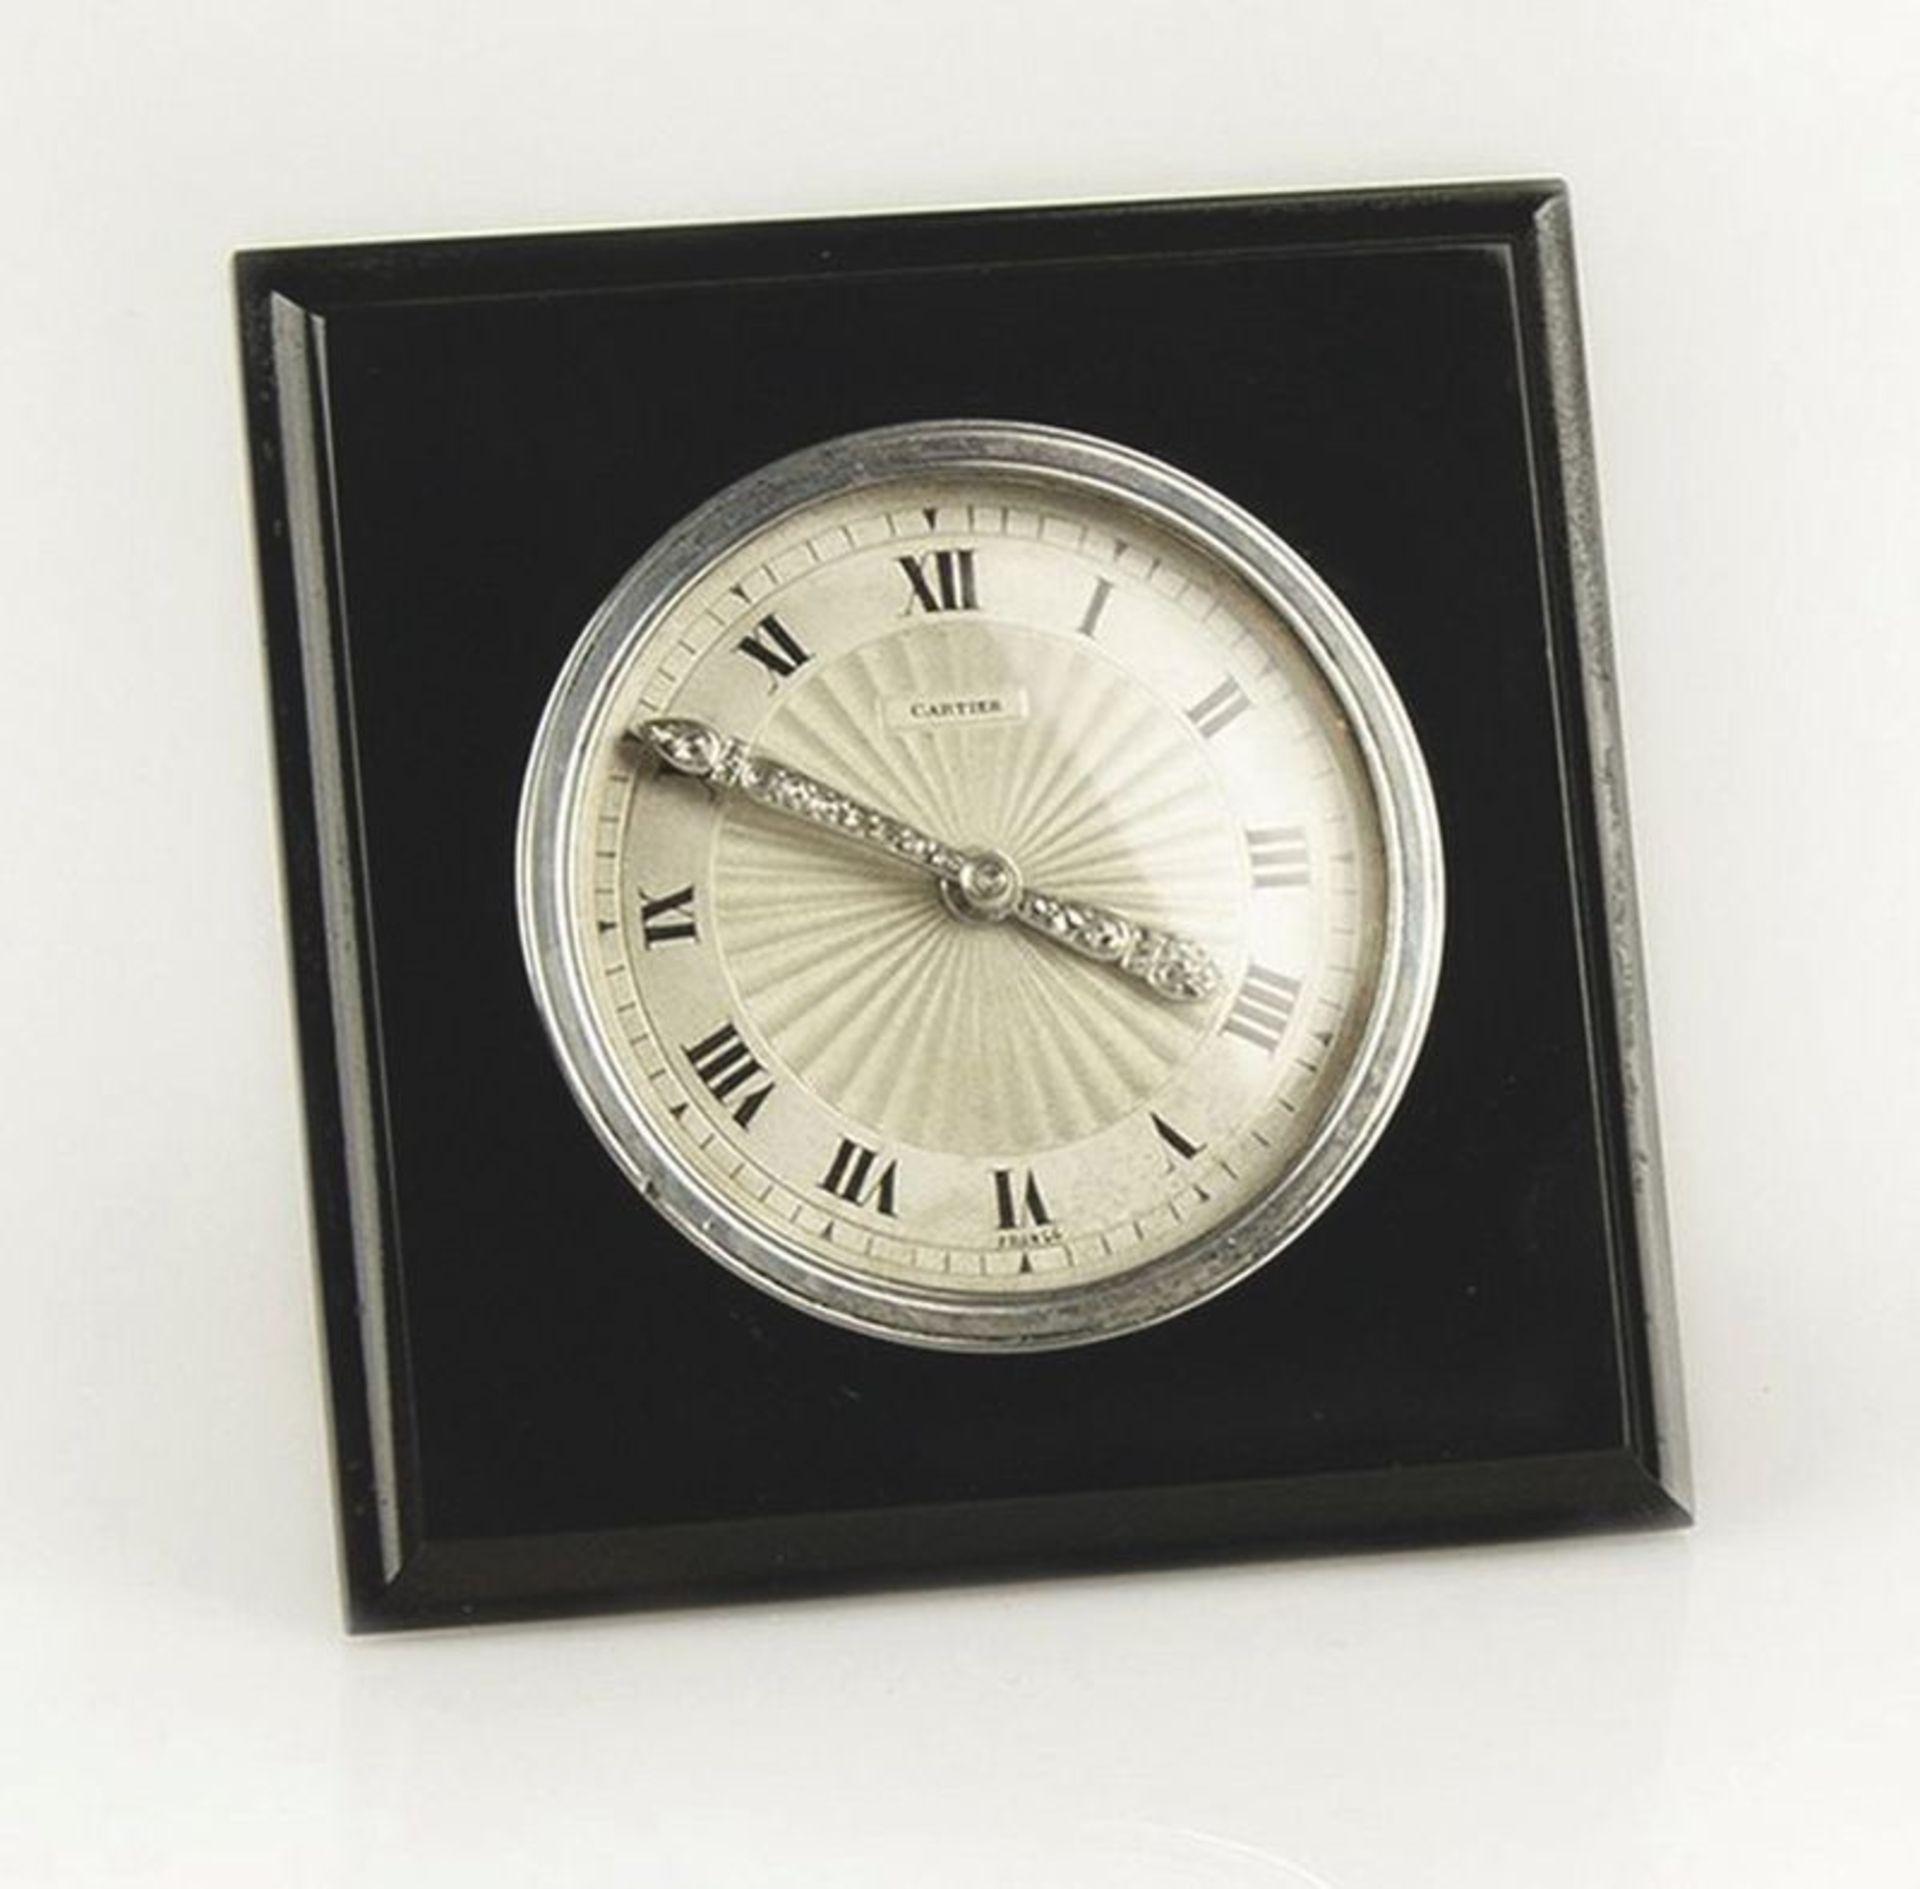 Cartier Table clock, 1939 - Moulded onyx, silver, rose-cut diamond hands set in [...] - Bild 2 aus 2